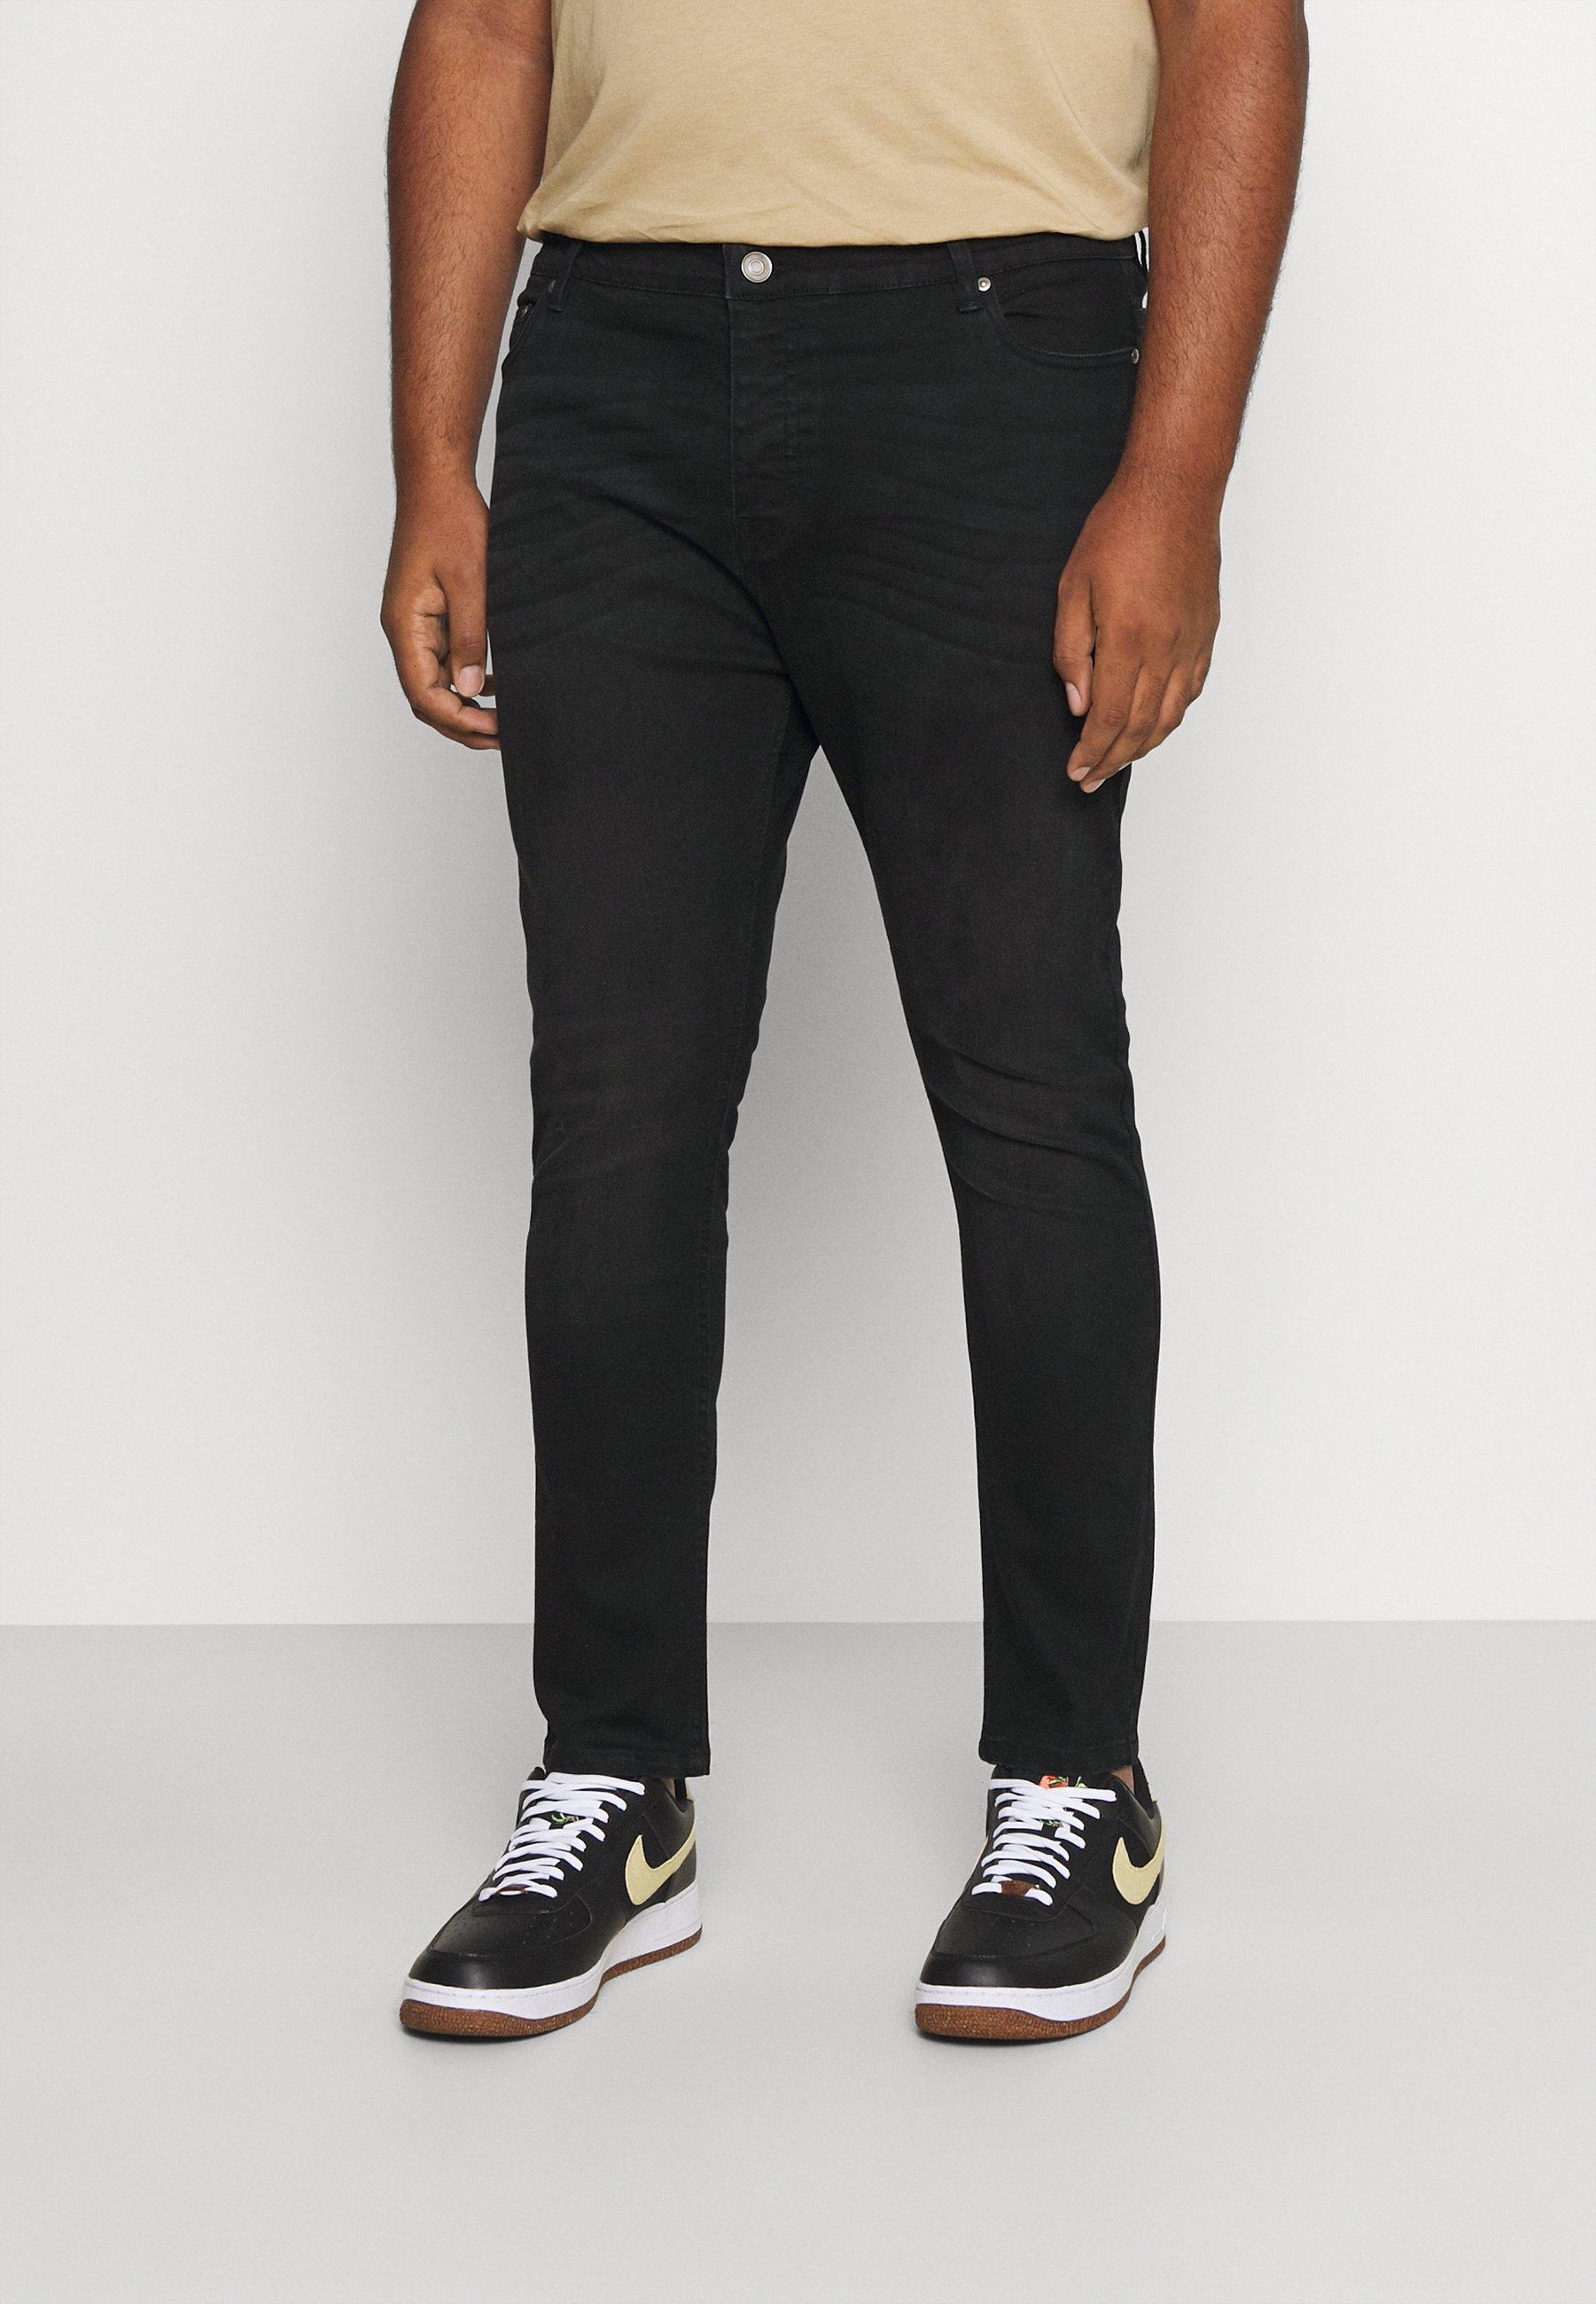 Uomo MADISON CHARC - Jeans slim fit